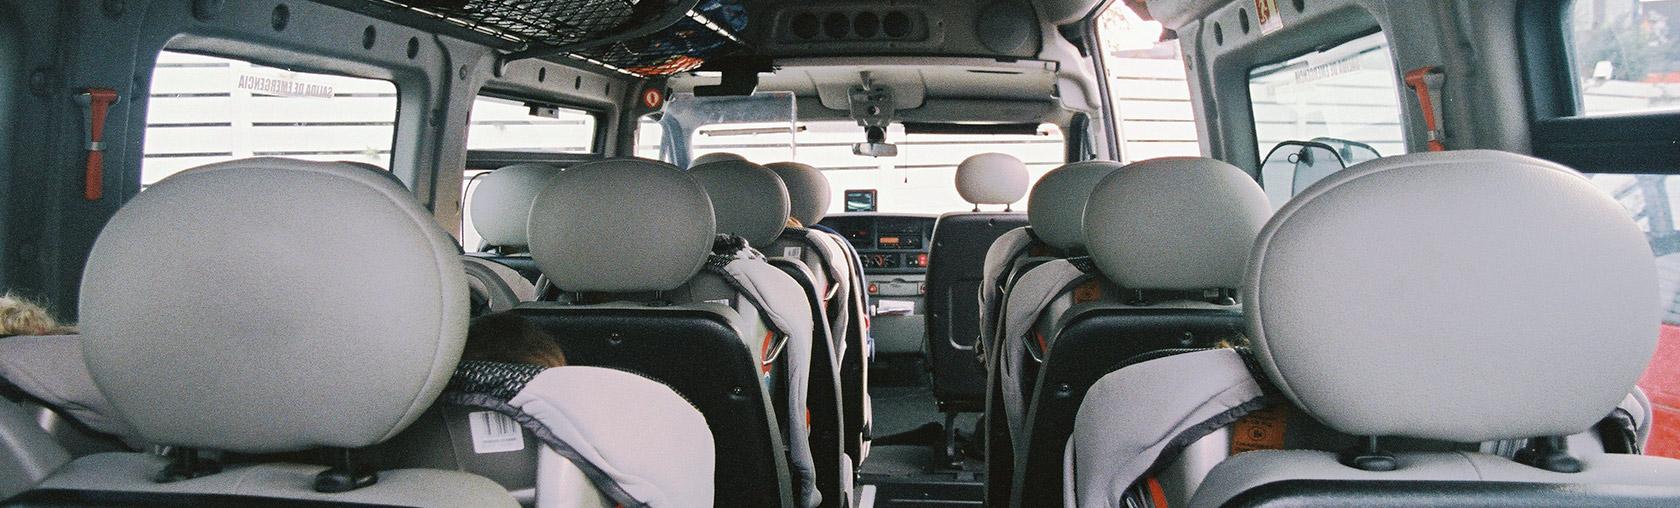 transporte-02